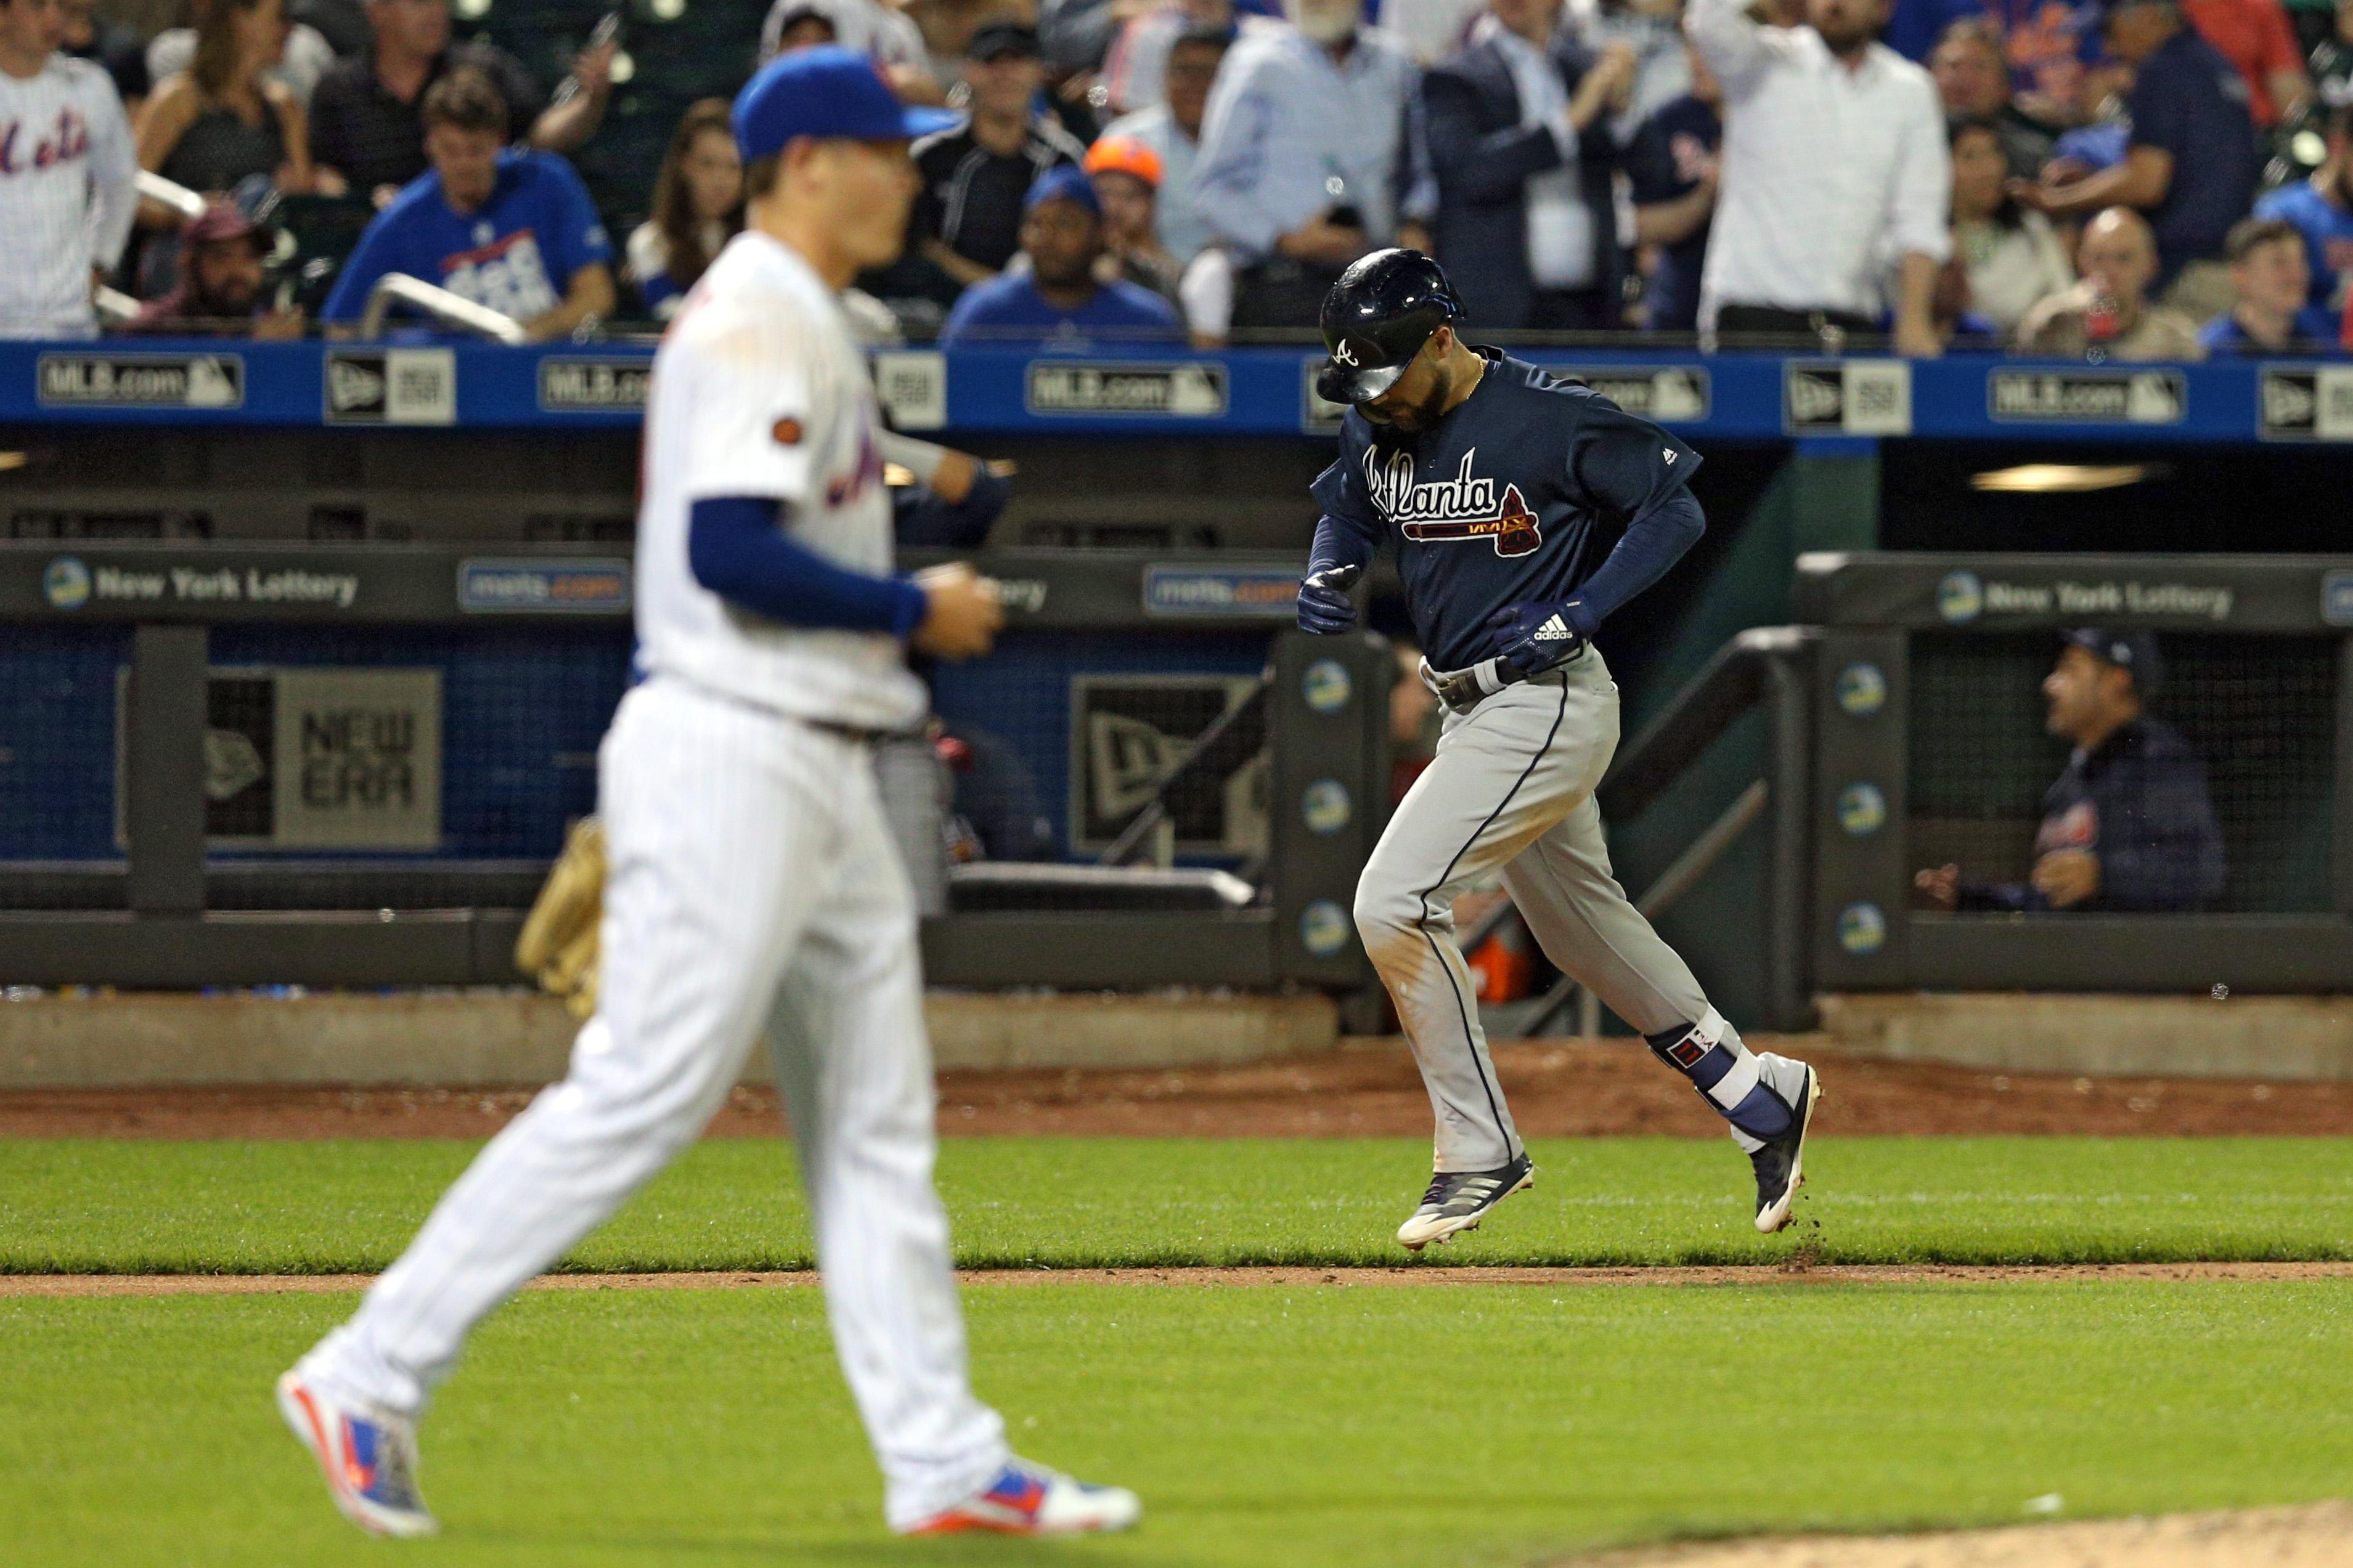 5/3/18 Game Preview: Atlanta Braves at New York Mets